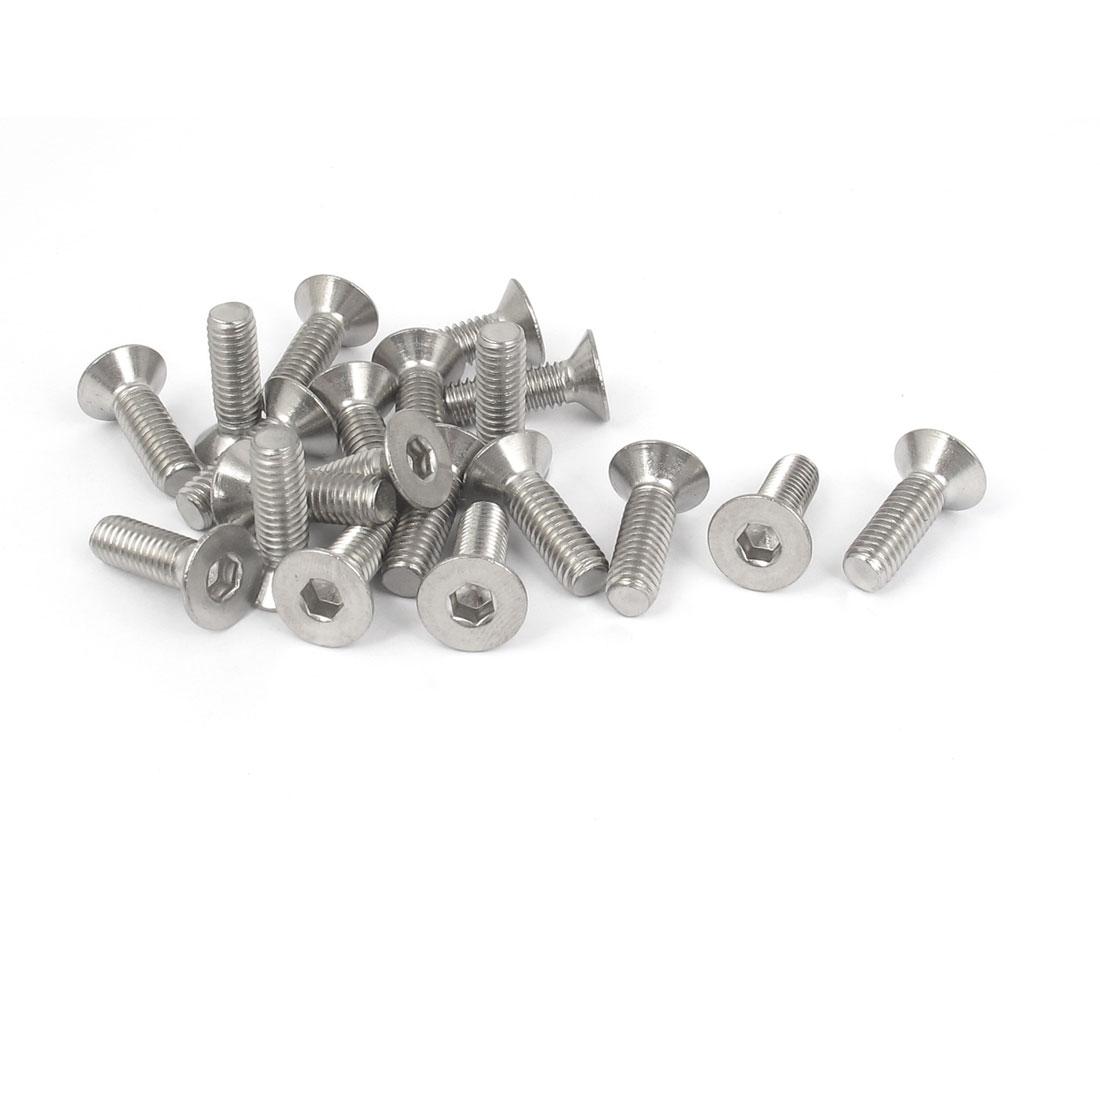 M6 x 20mm Metric 304 Stainless Steel Hex Socket Countersunk Flat Head Screw Bolts 20PCS